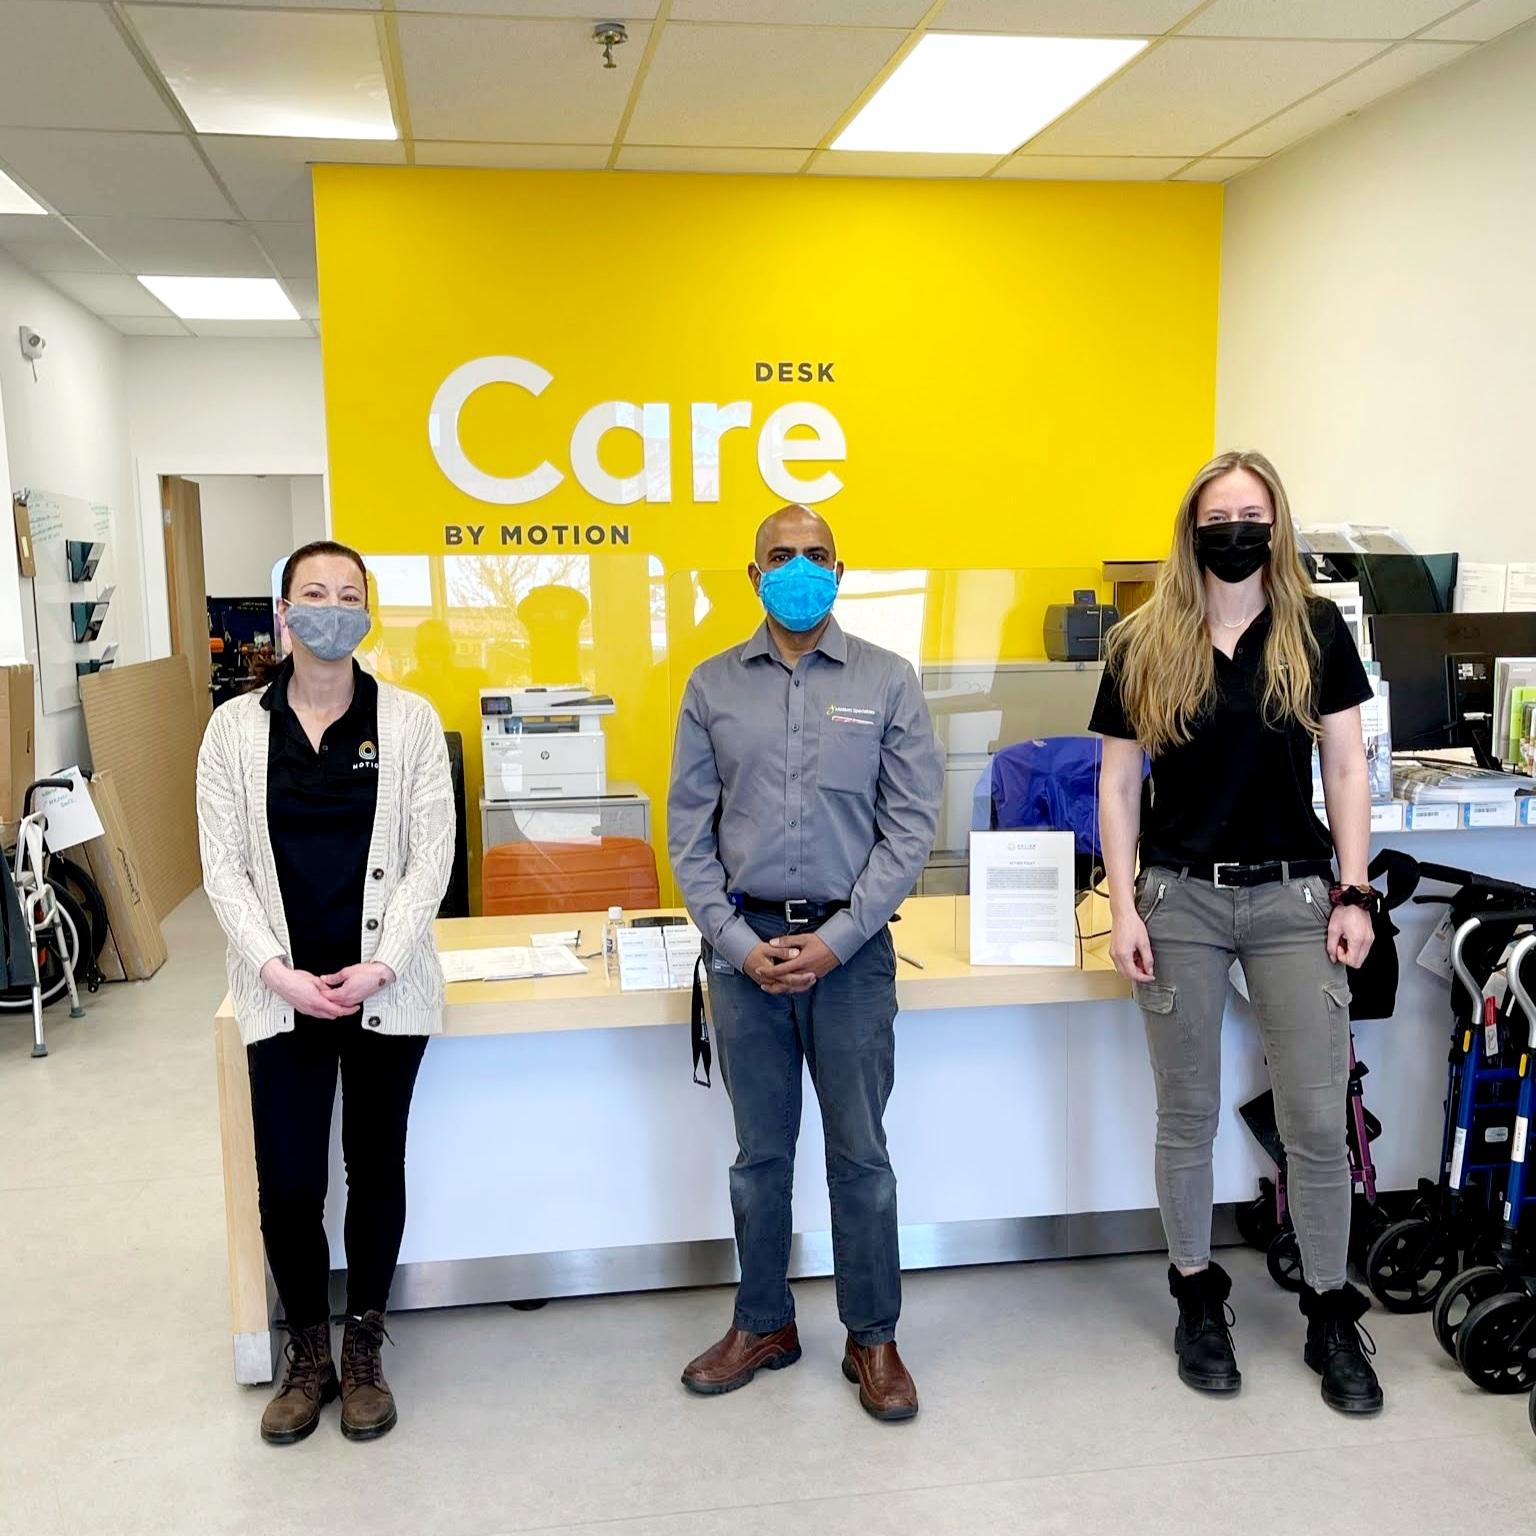 Comox care desk with team members